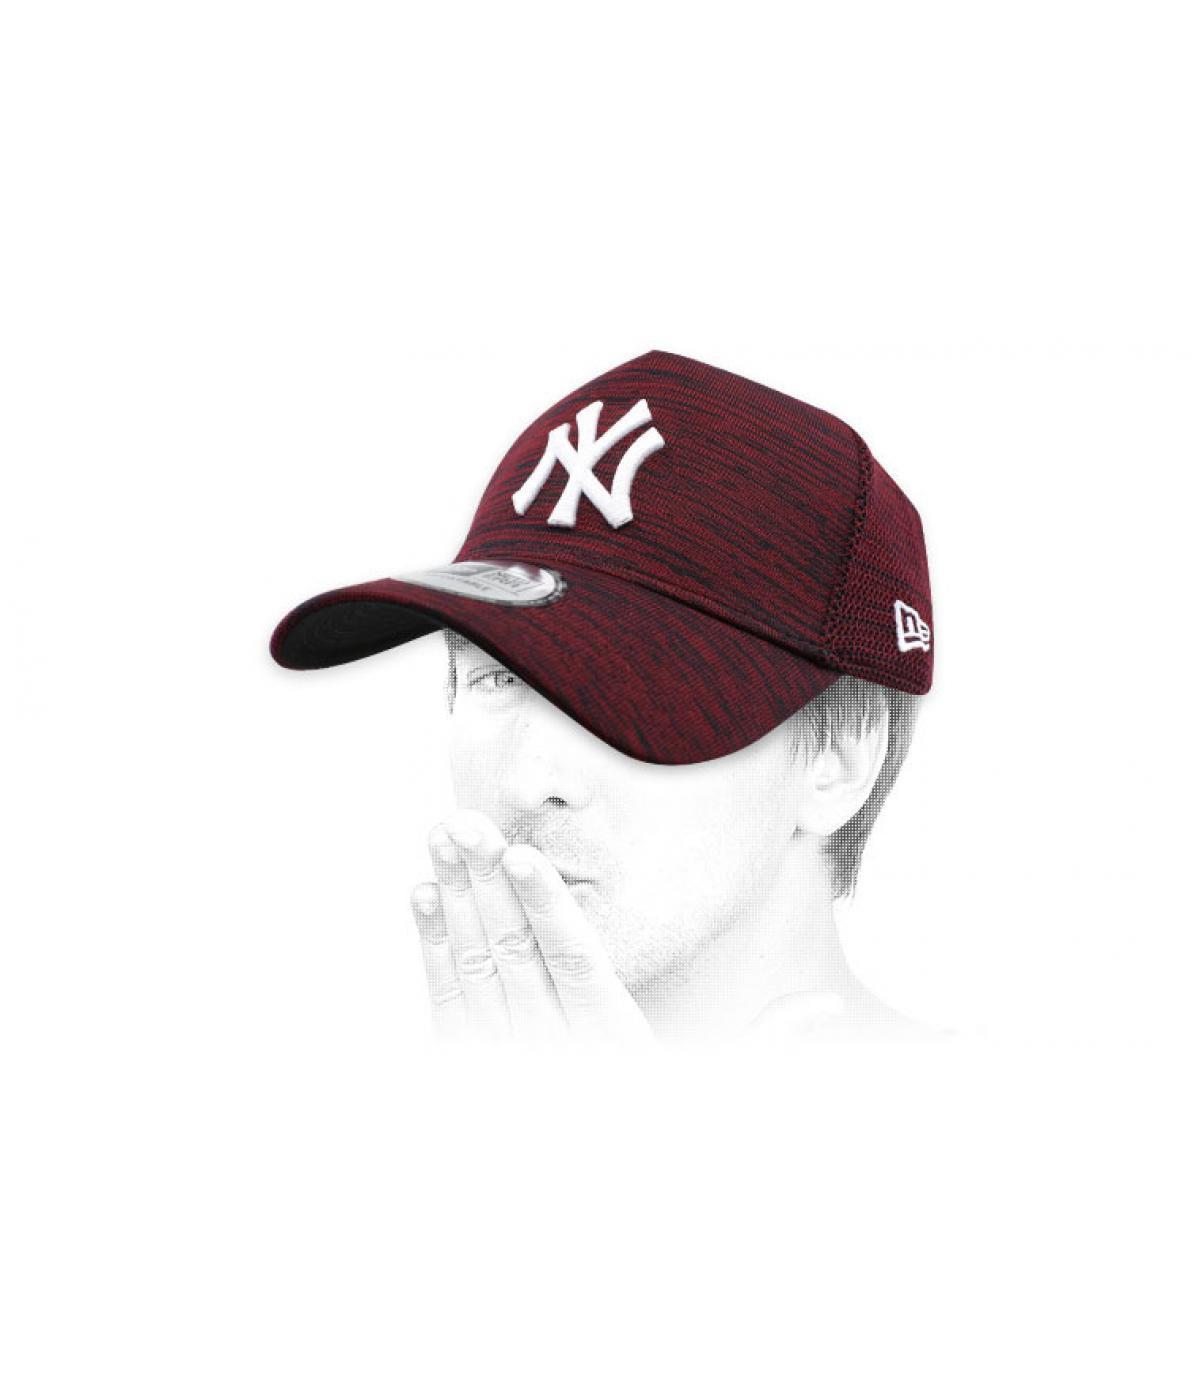 NY cappello di bordeaux